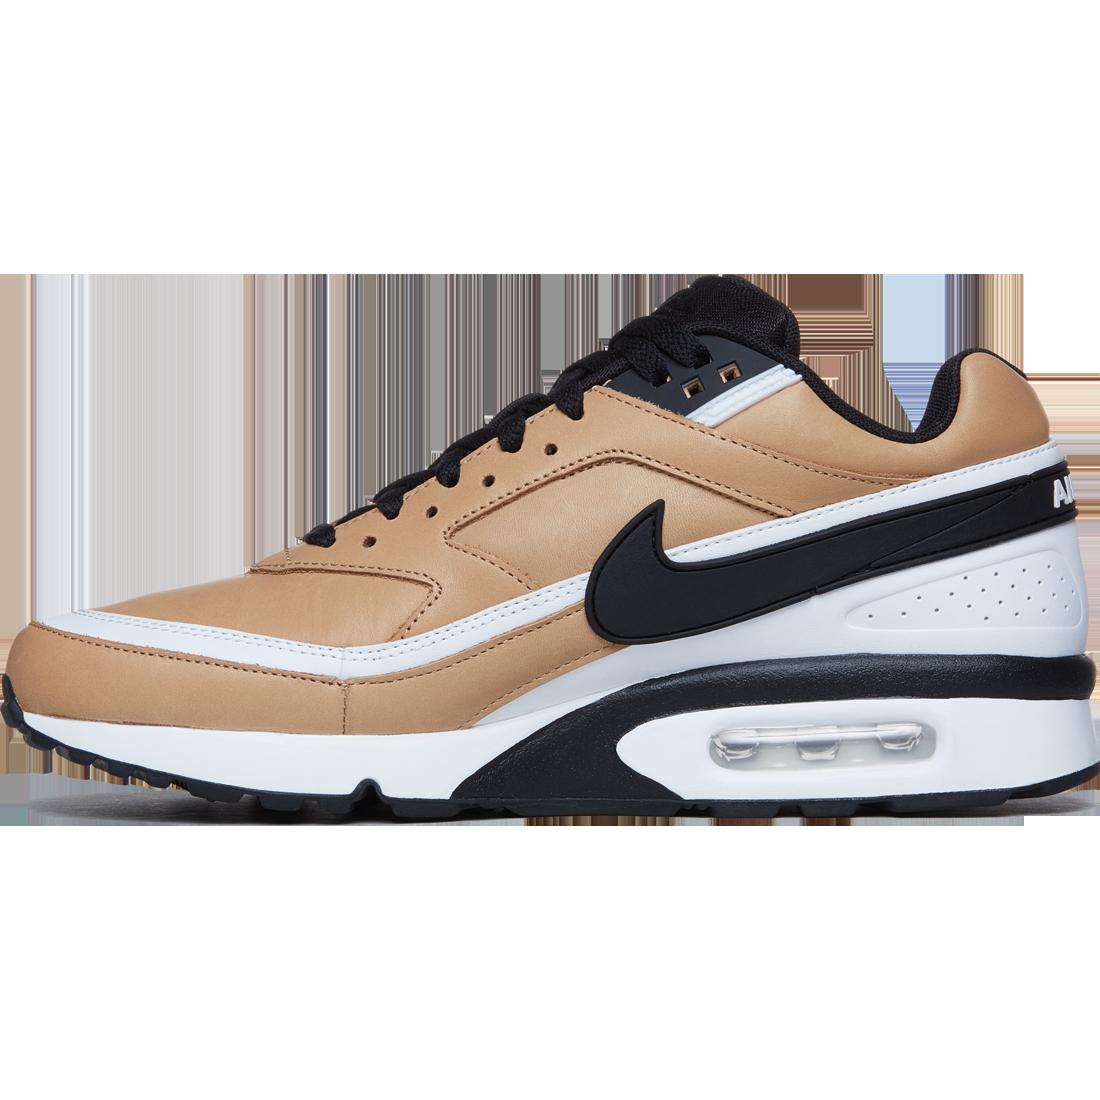 Nike Air Max BW Premium 201